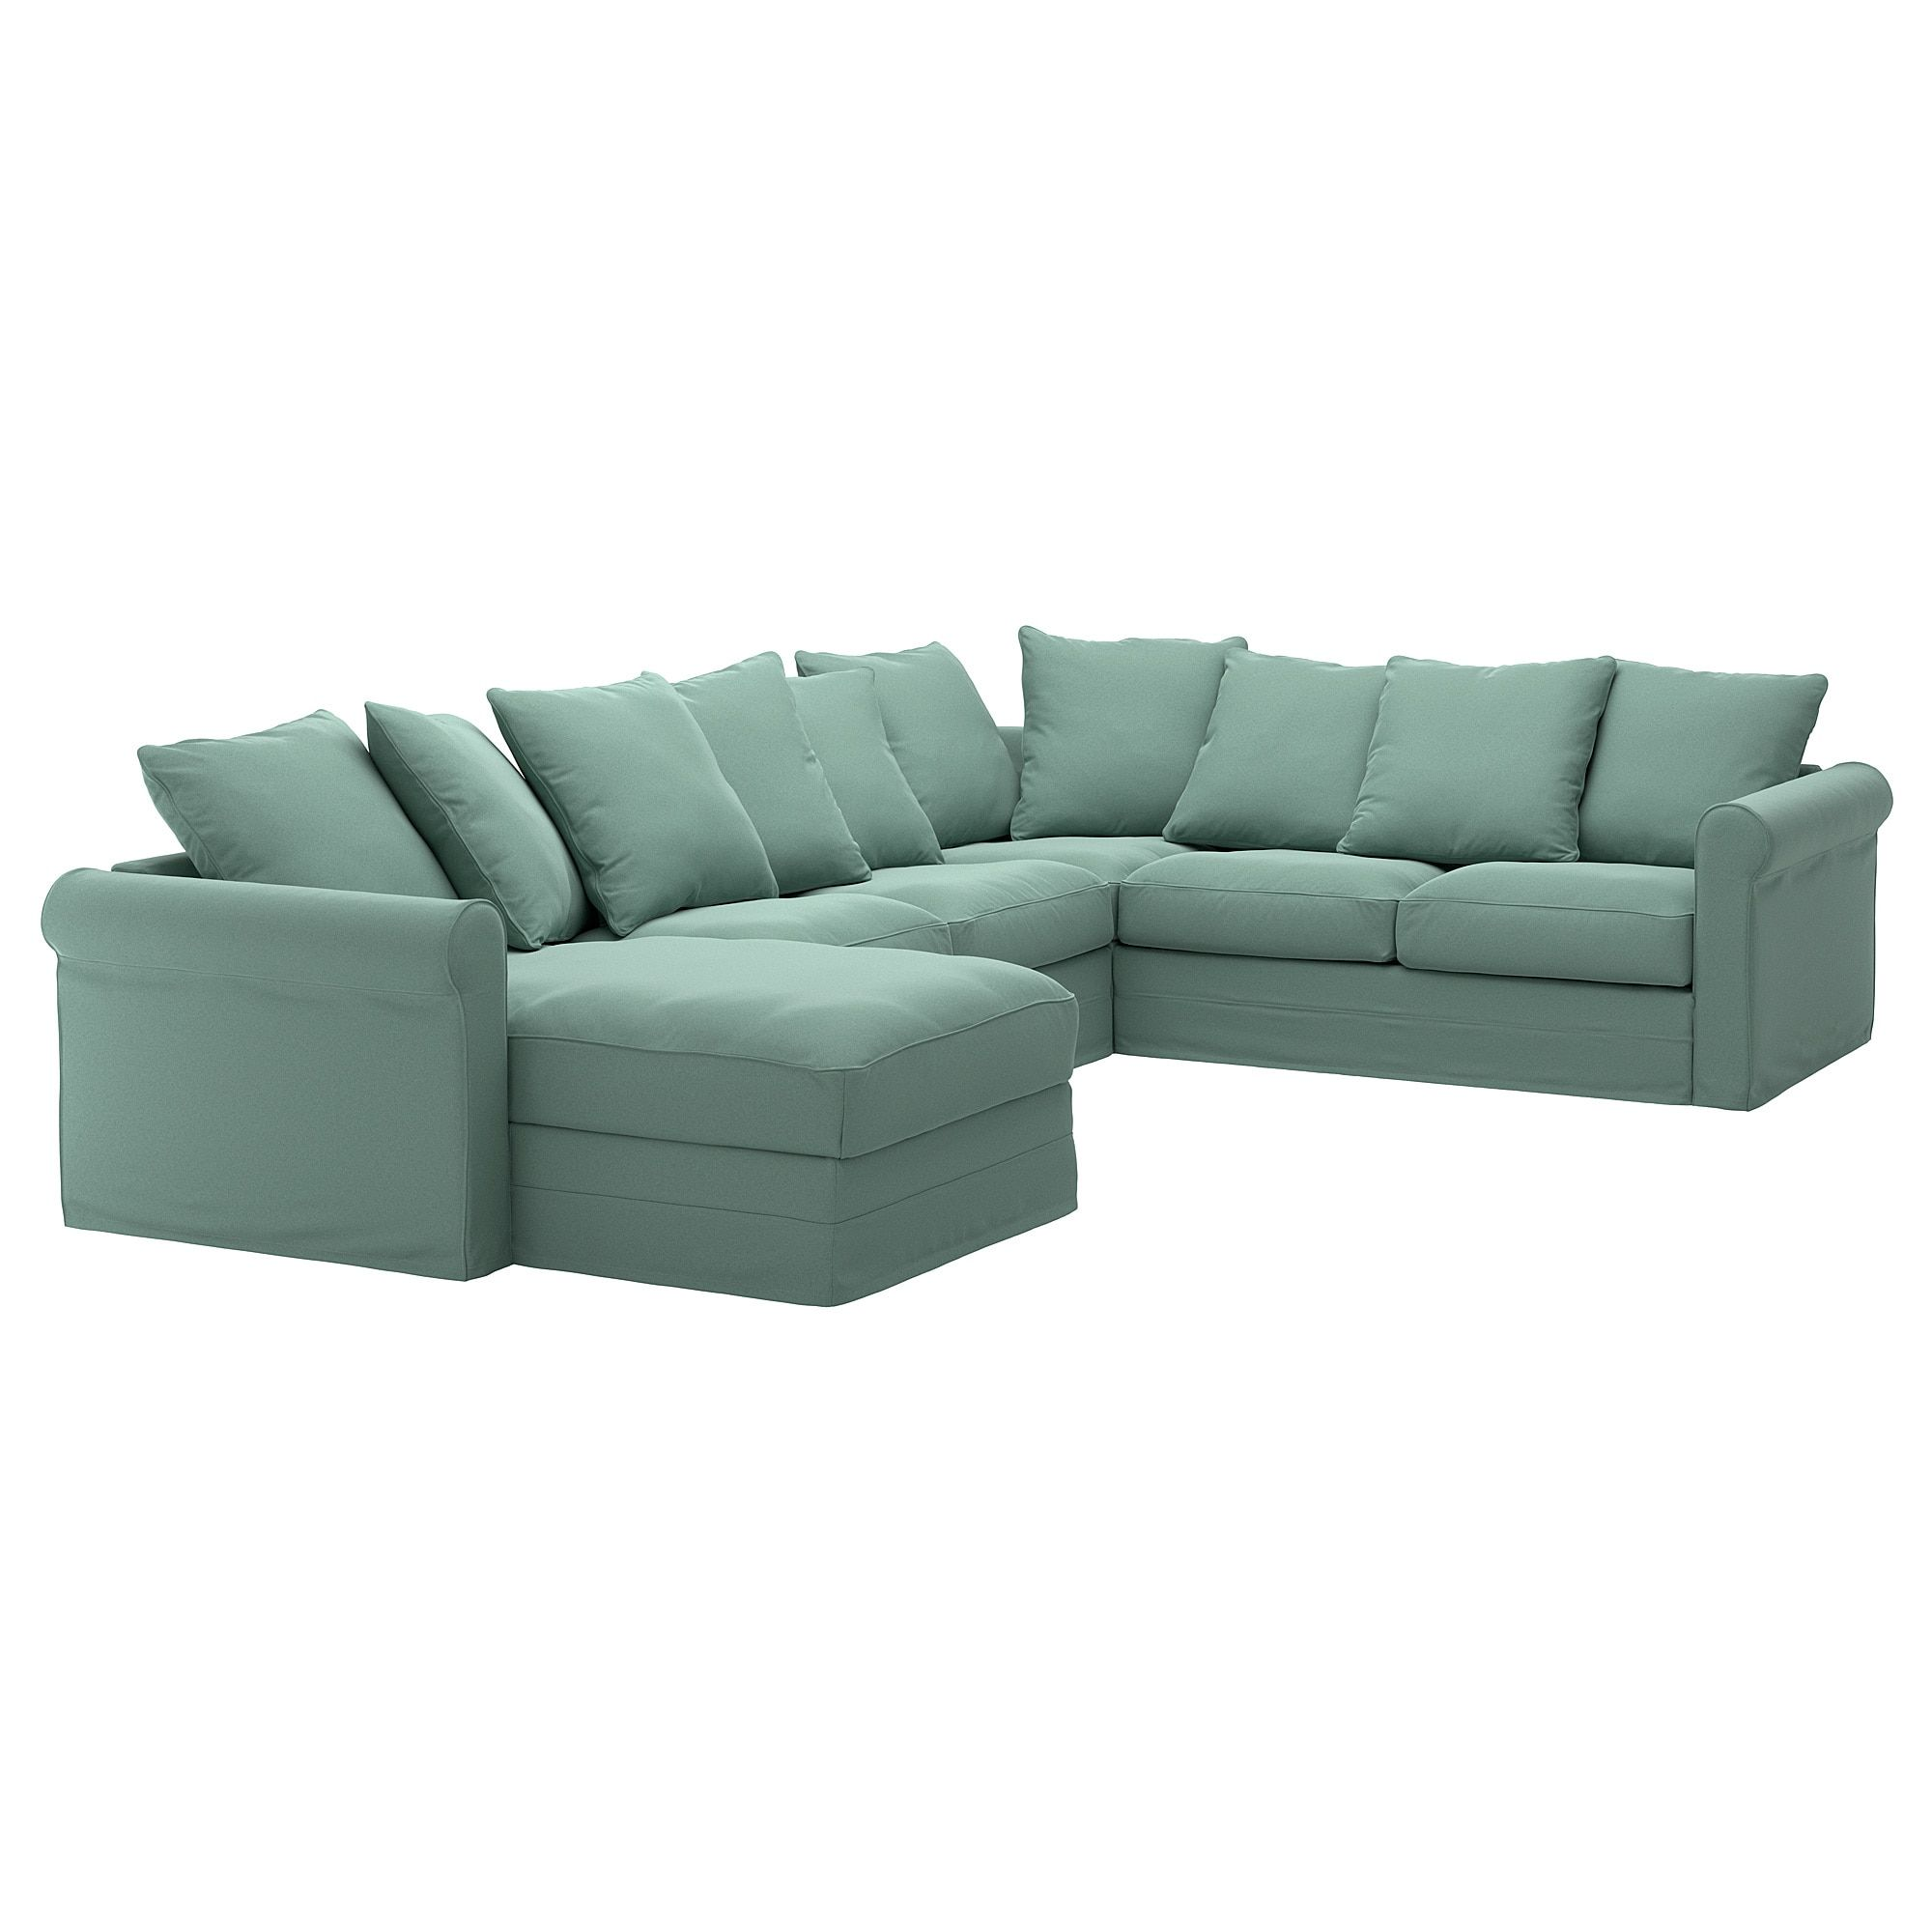 Gronlid Ecksofa 5 Sitzig Mit Recamiere Ljungen Hellgrun Ikea Deutschland Ikea L Shaped Sofa Corner Sofa L Shaped Sofa